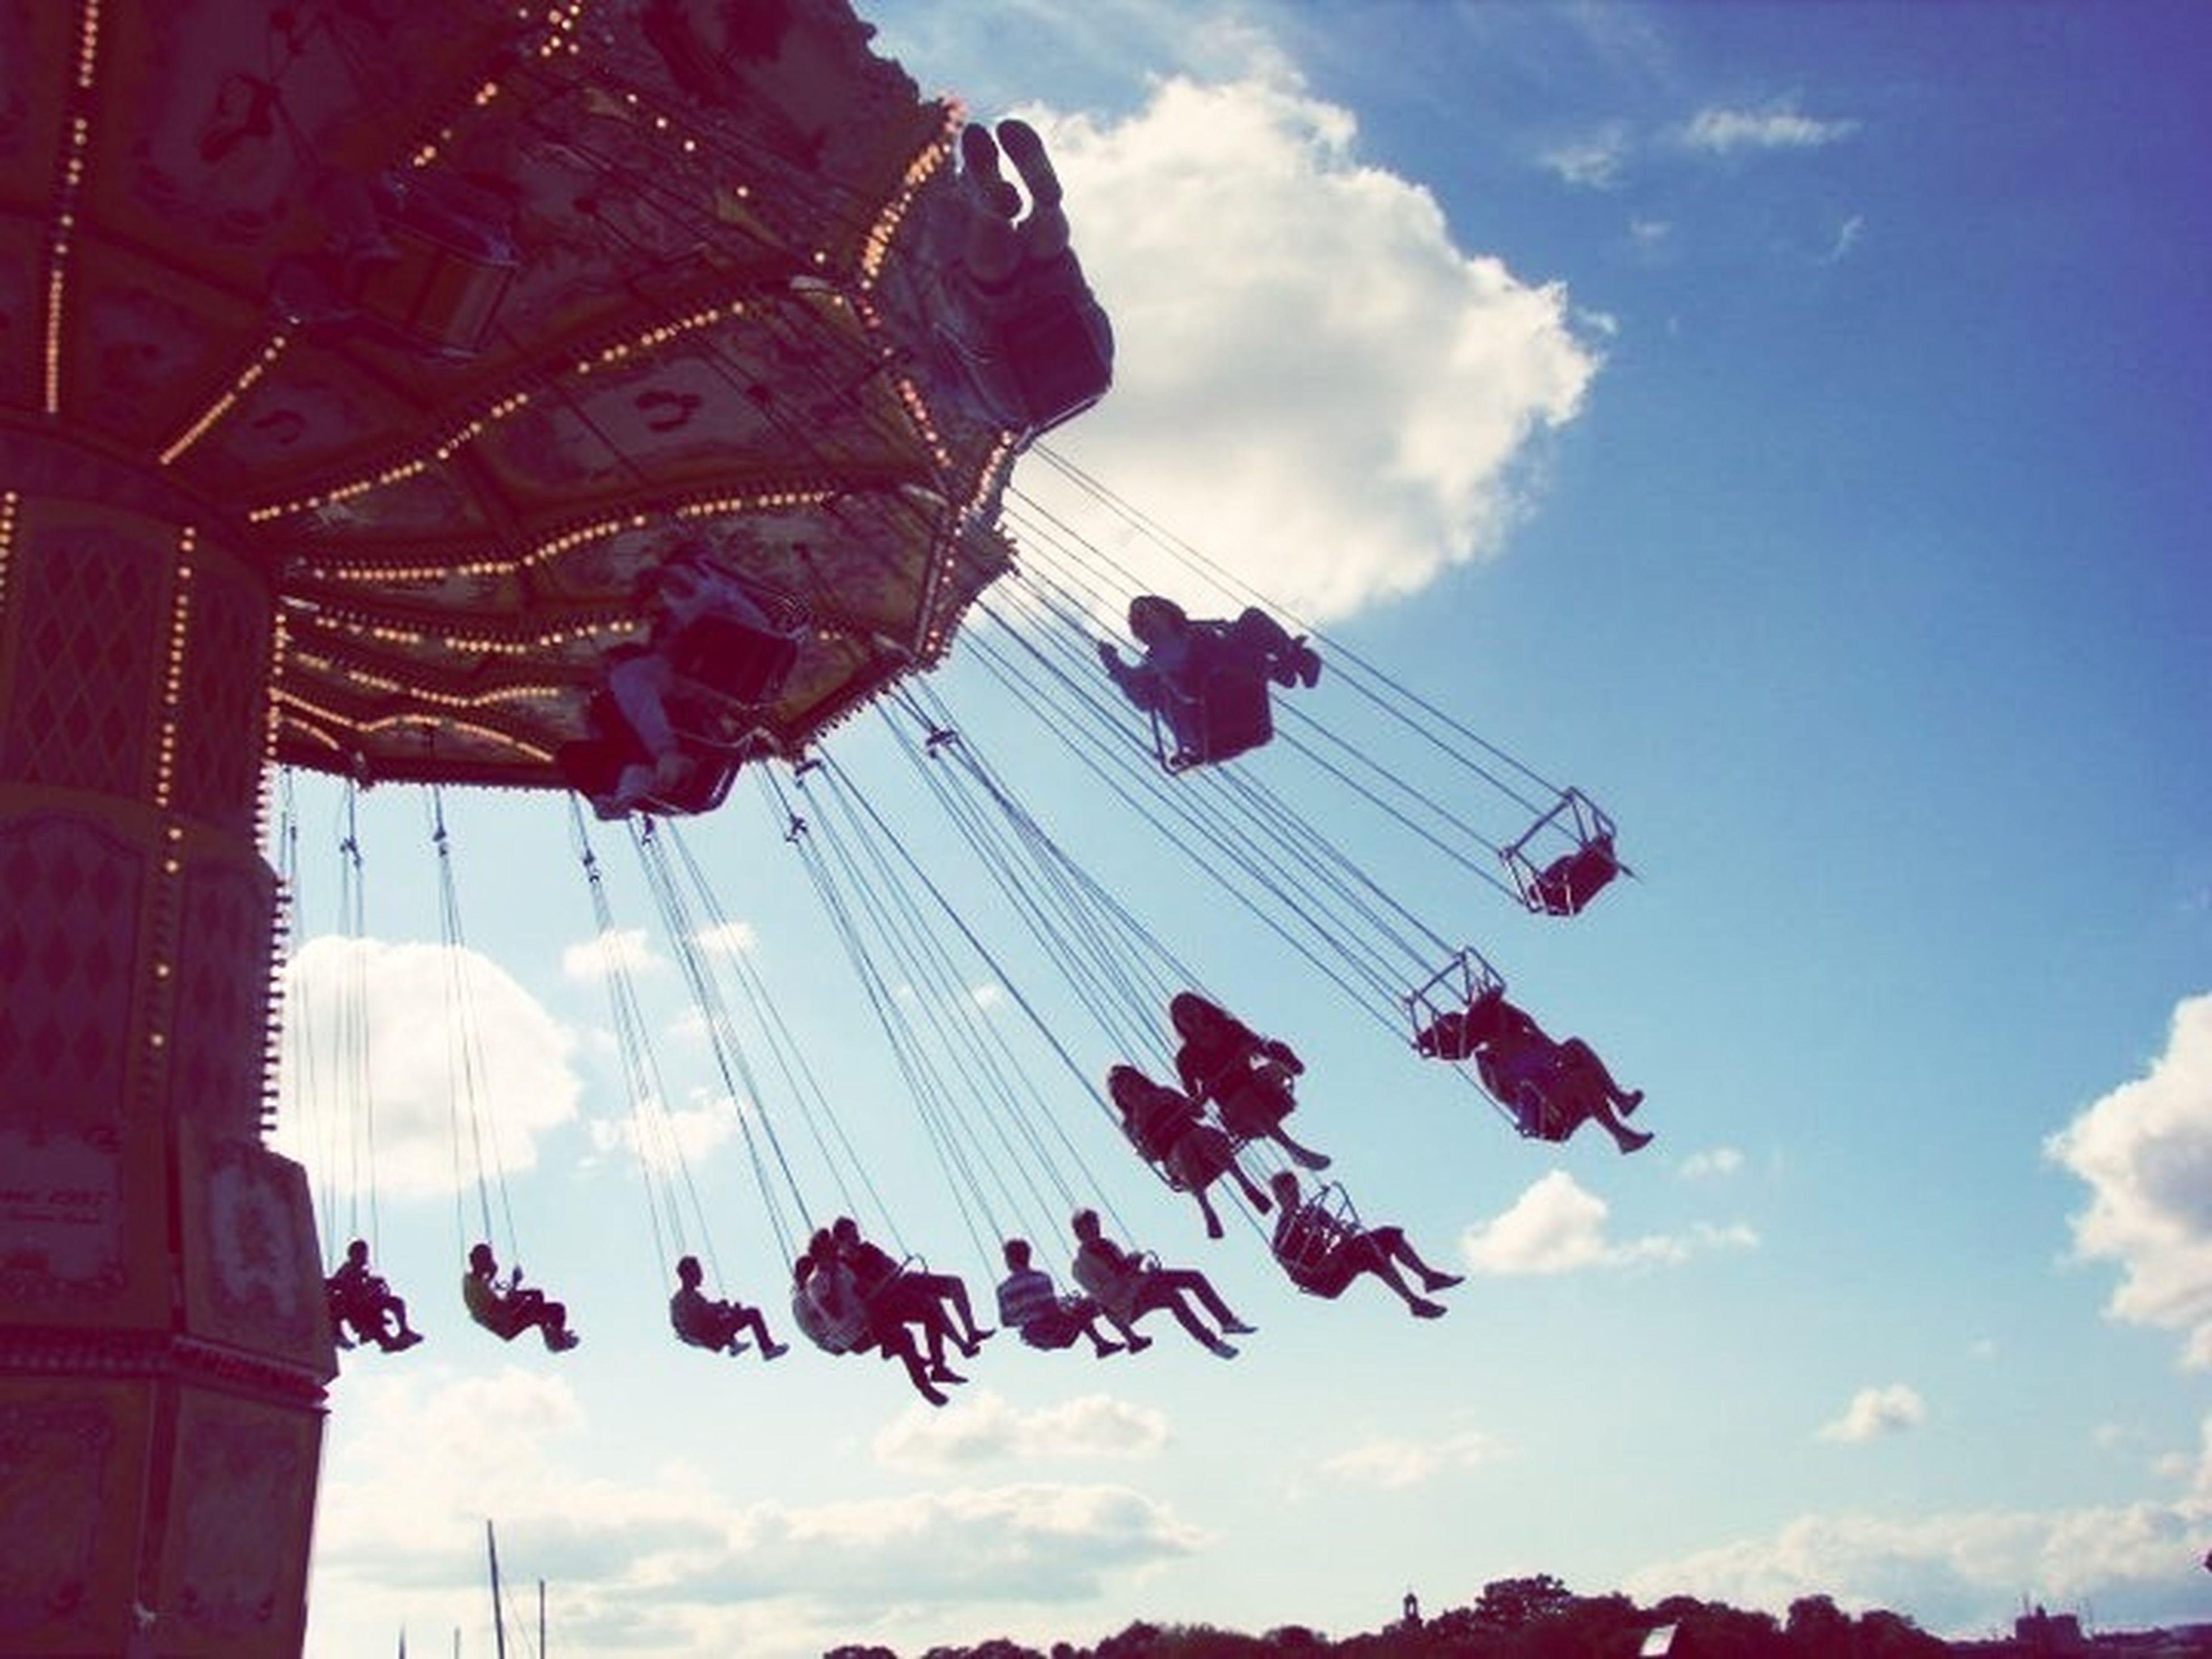 Summer Beautiful Swinging Photo